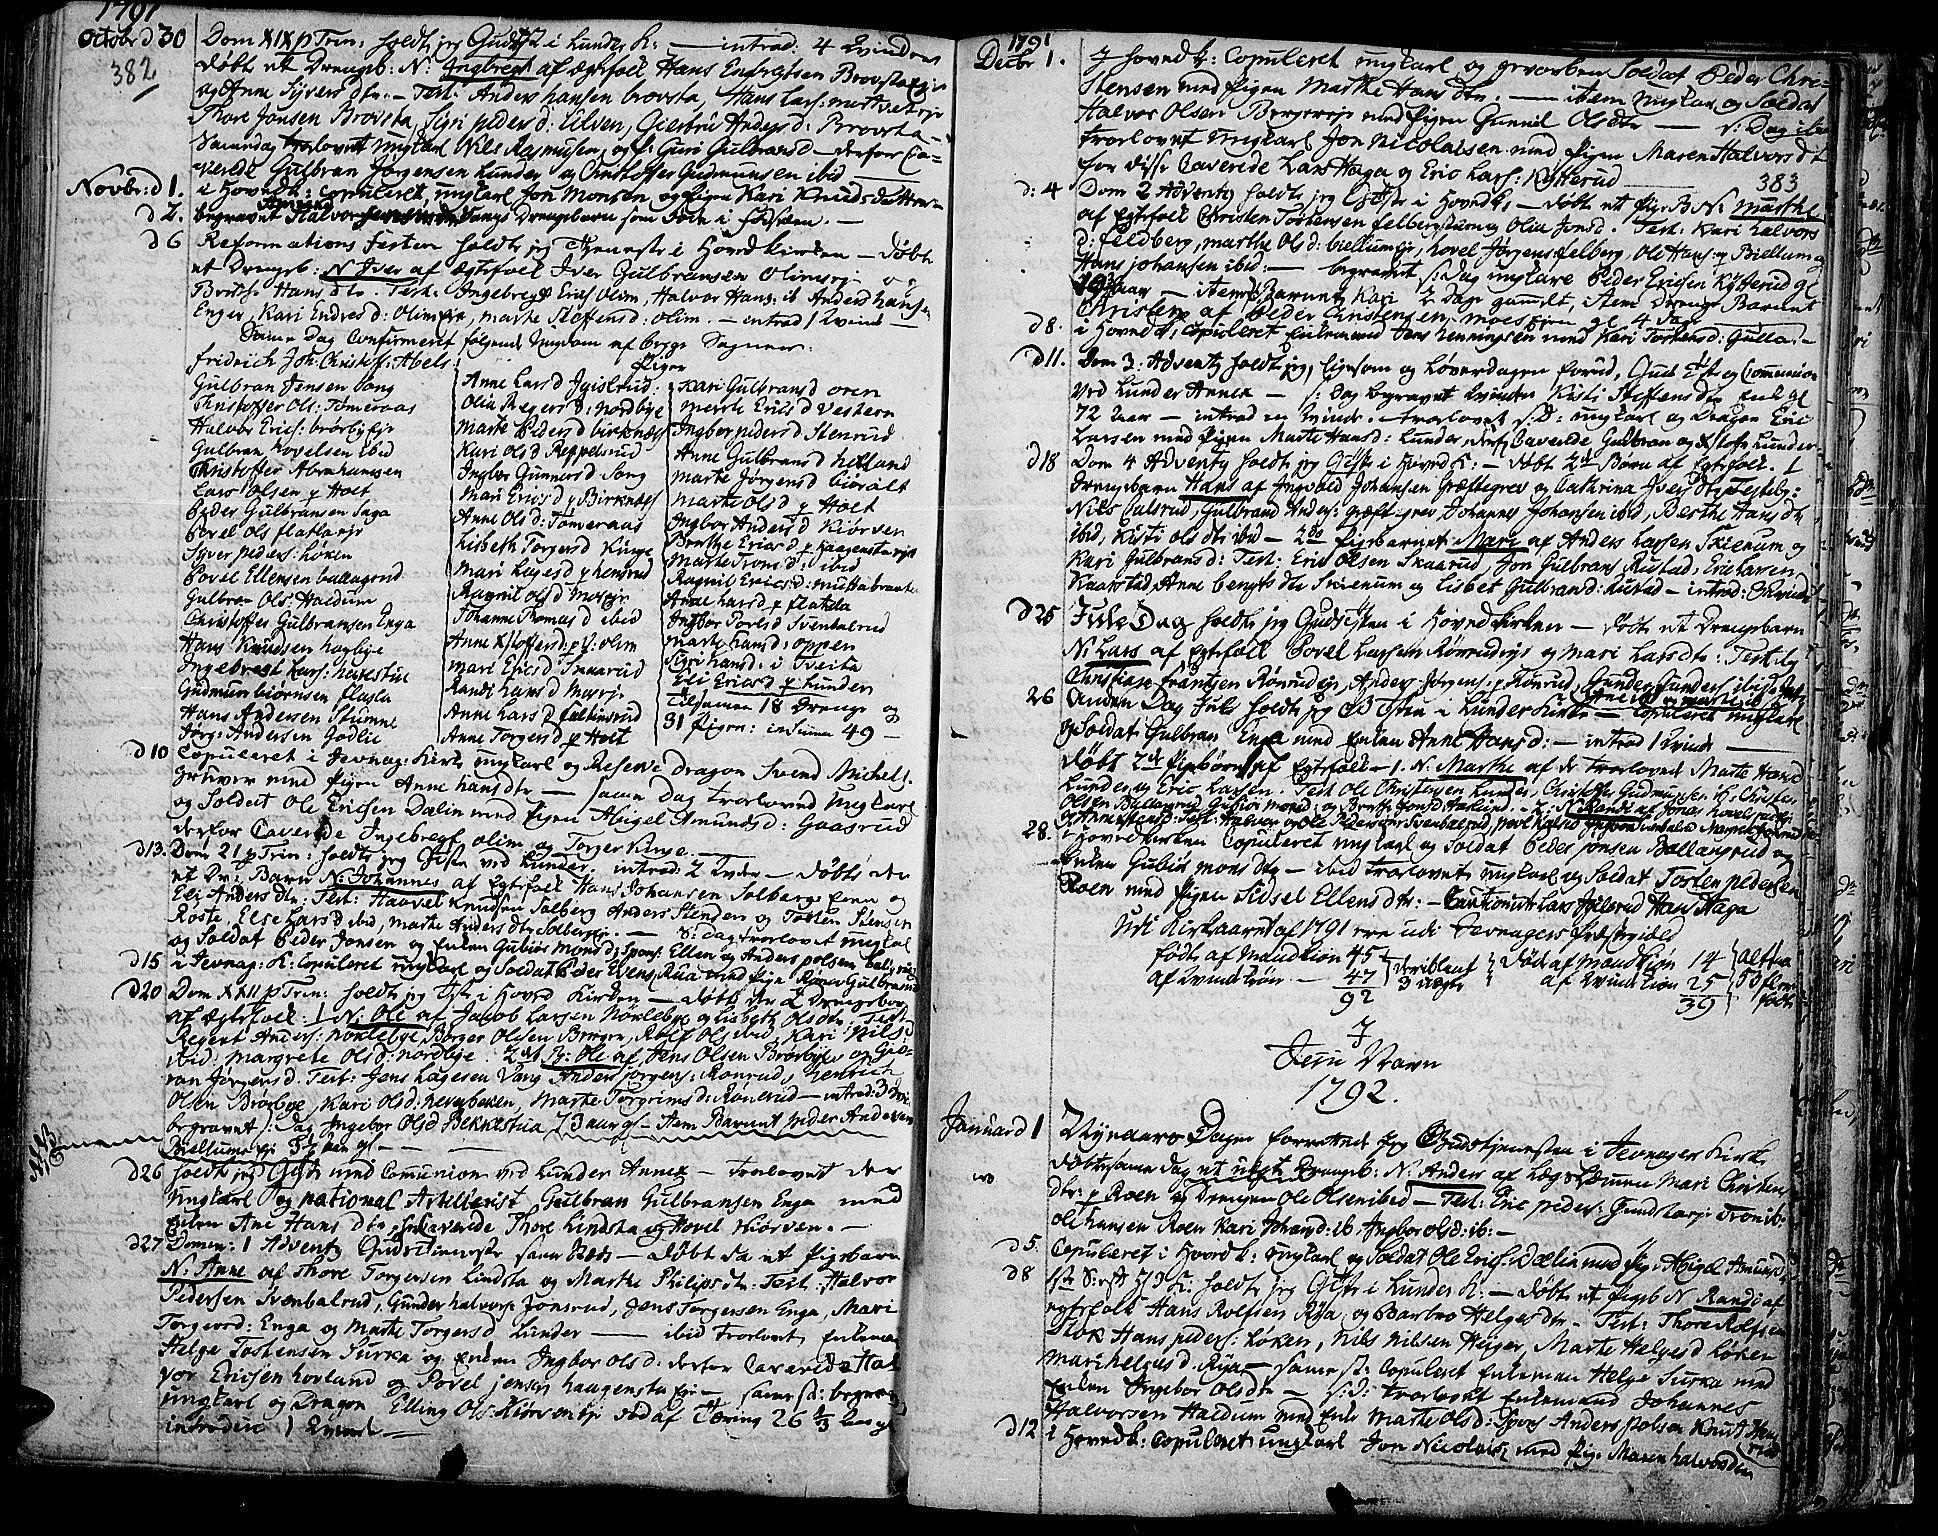 SAH, Jevnaker prestekontor, Ministerialbok nr. 3, 1752-1799, s. 382-383